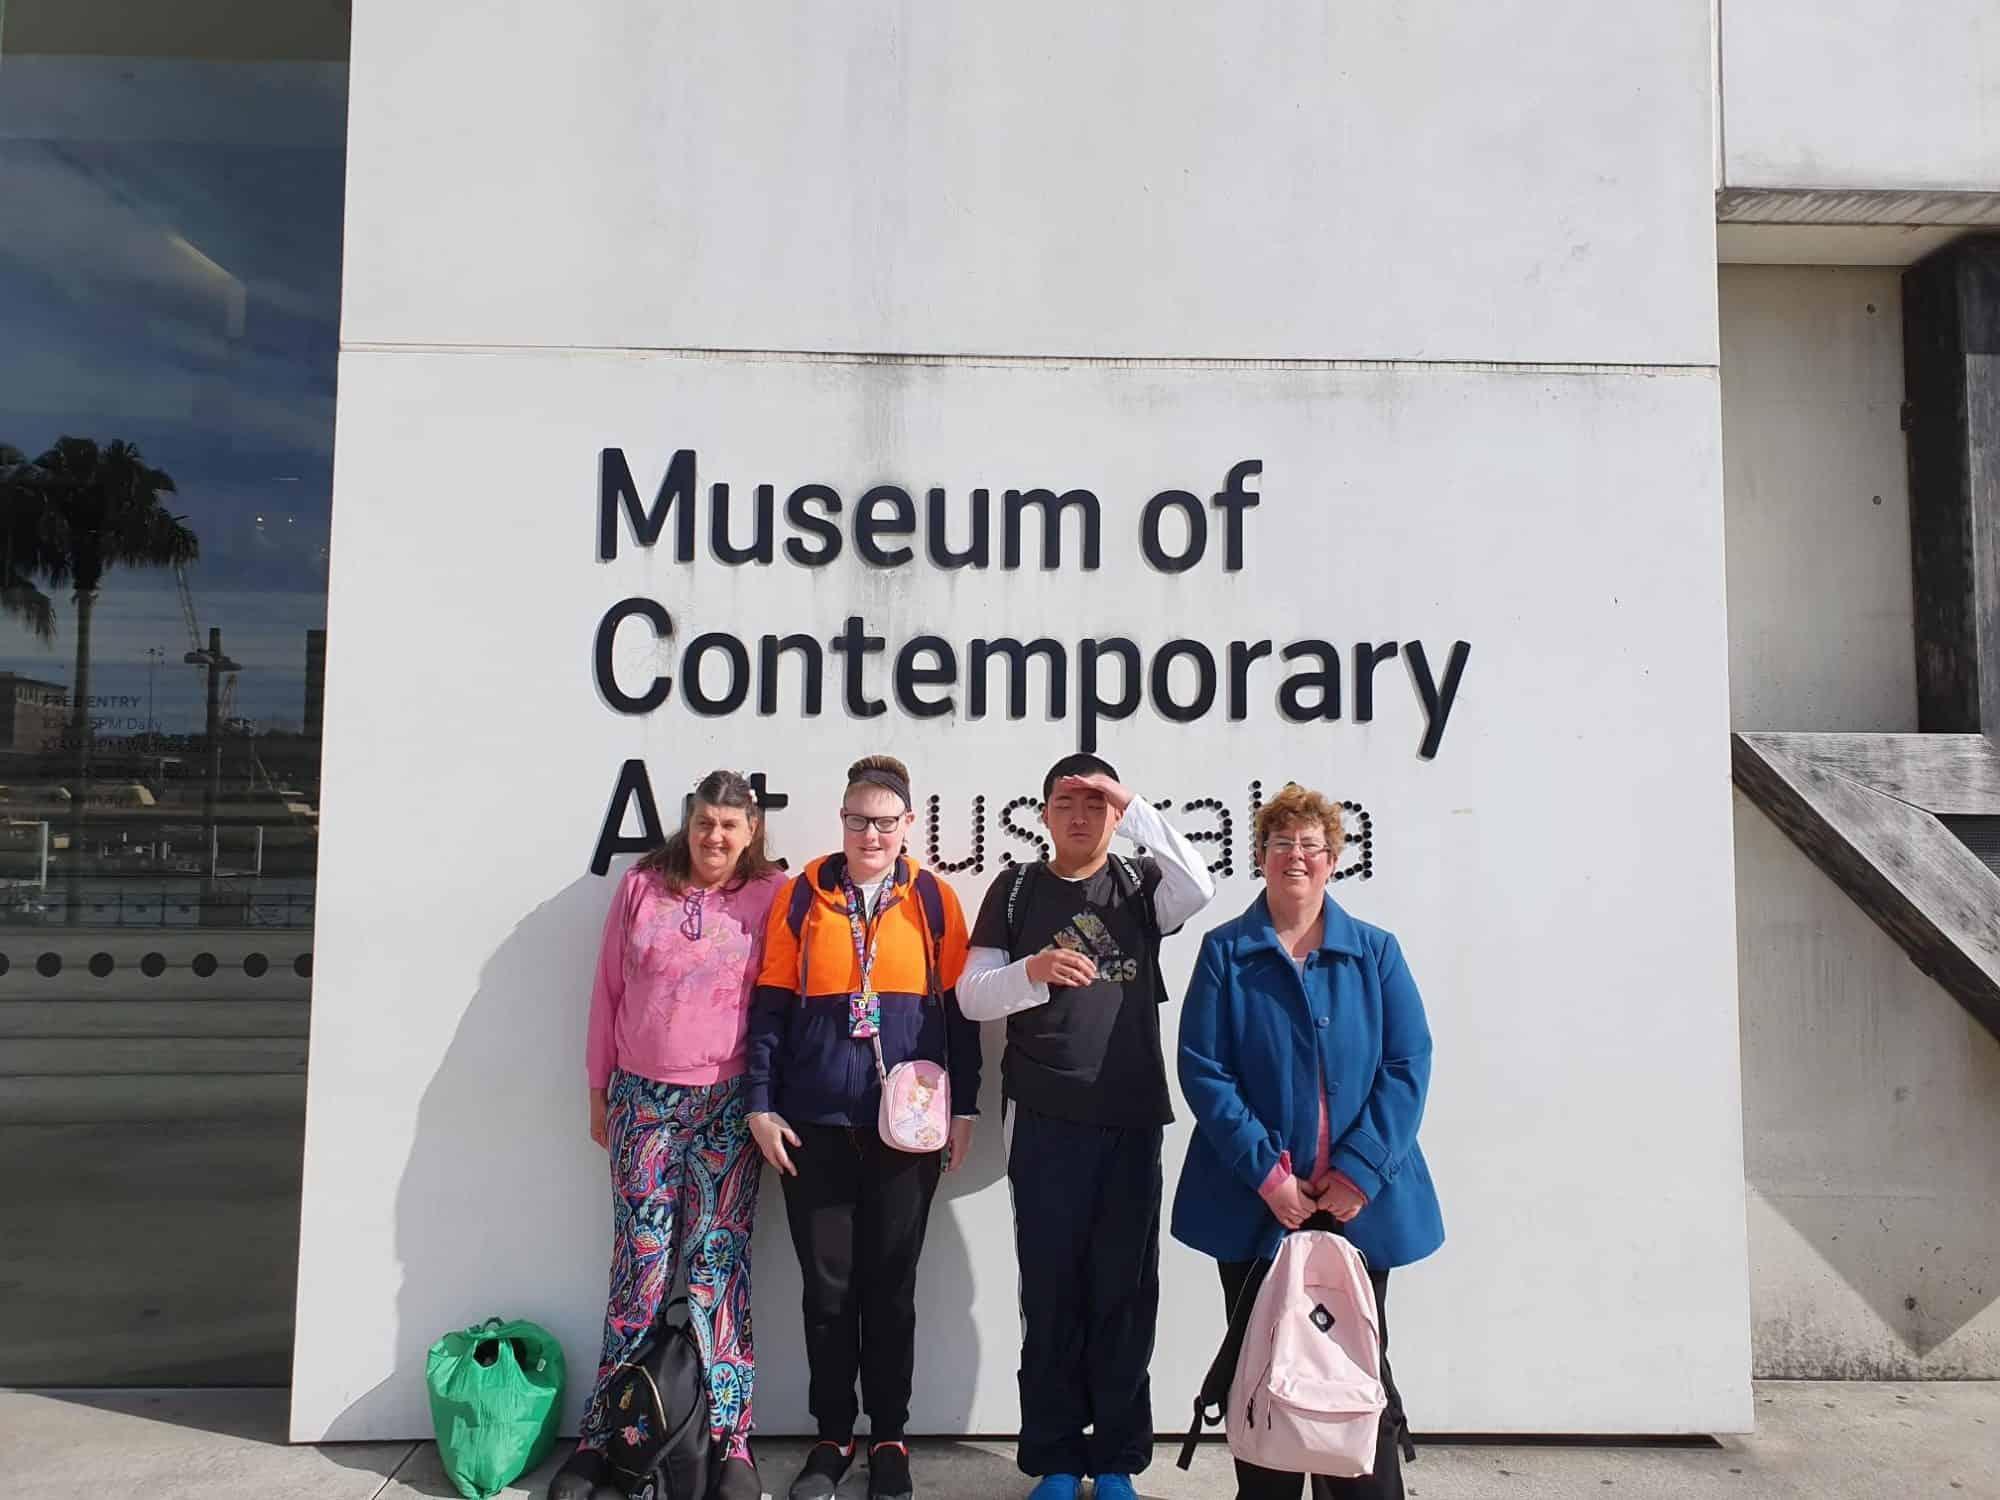 MCA- Civic art tours